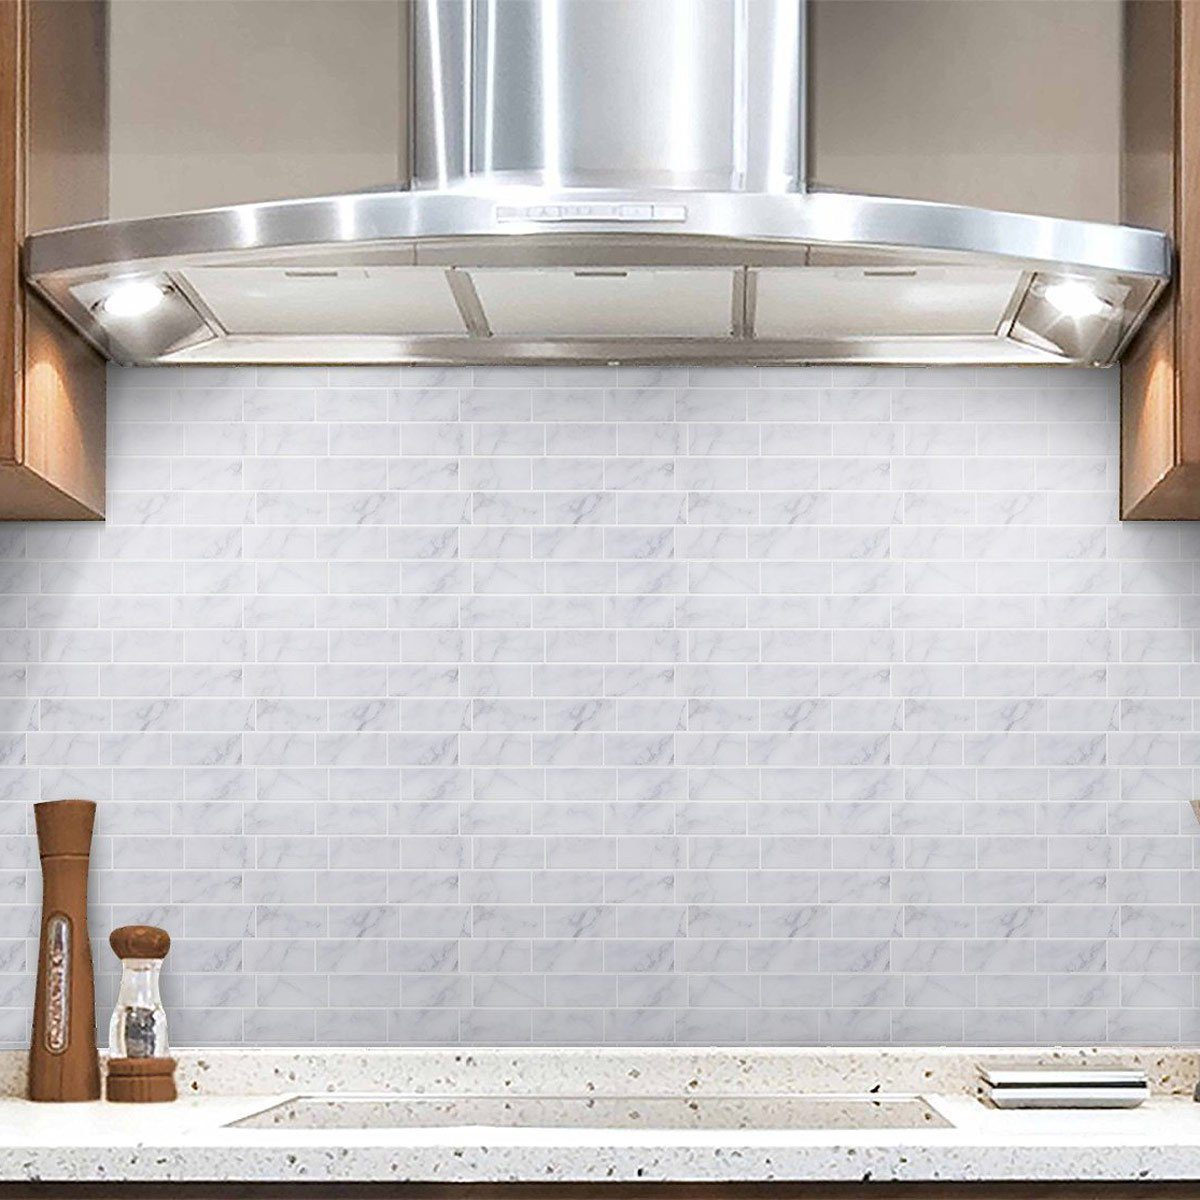 - 30 Kitchen Backsplash Ideas Taste Of Home